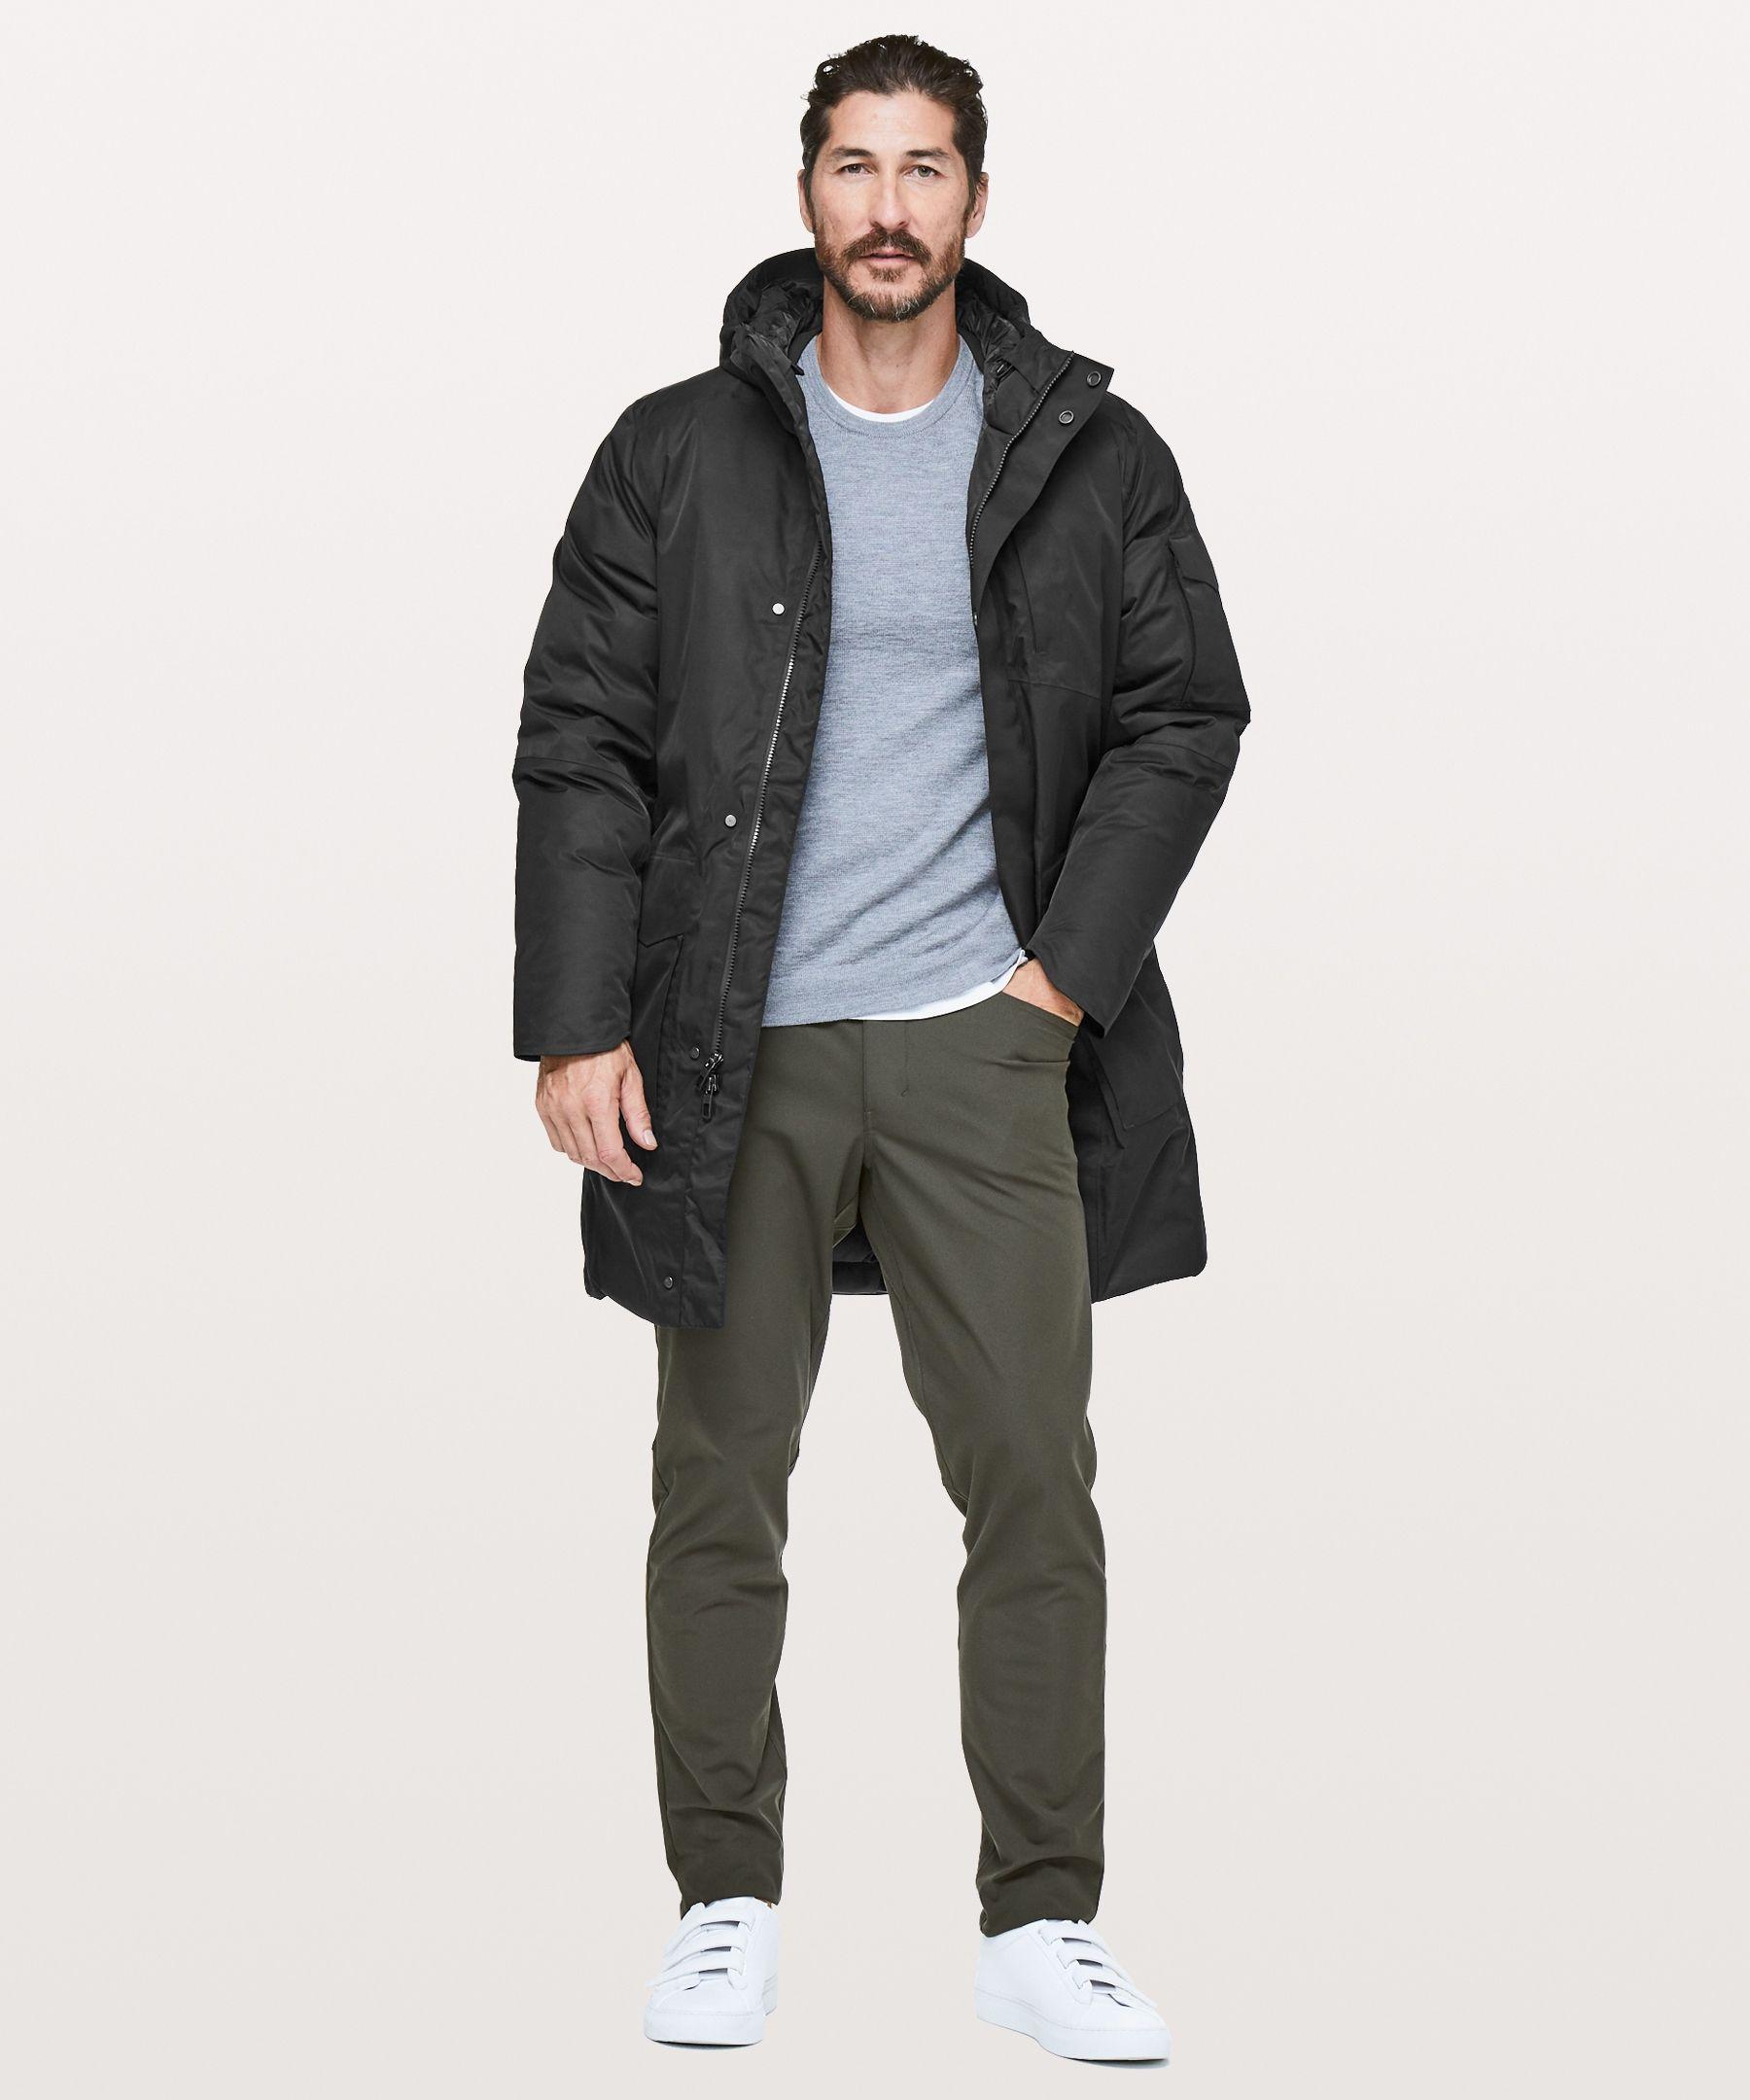 Cold City Parka Men S Jackets Coats Lululemon Mens Jackets Mens Parka Parka [ 2160 x 1800 Pixel ]